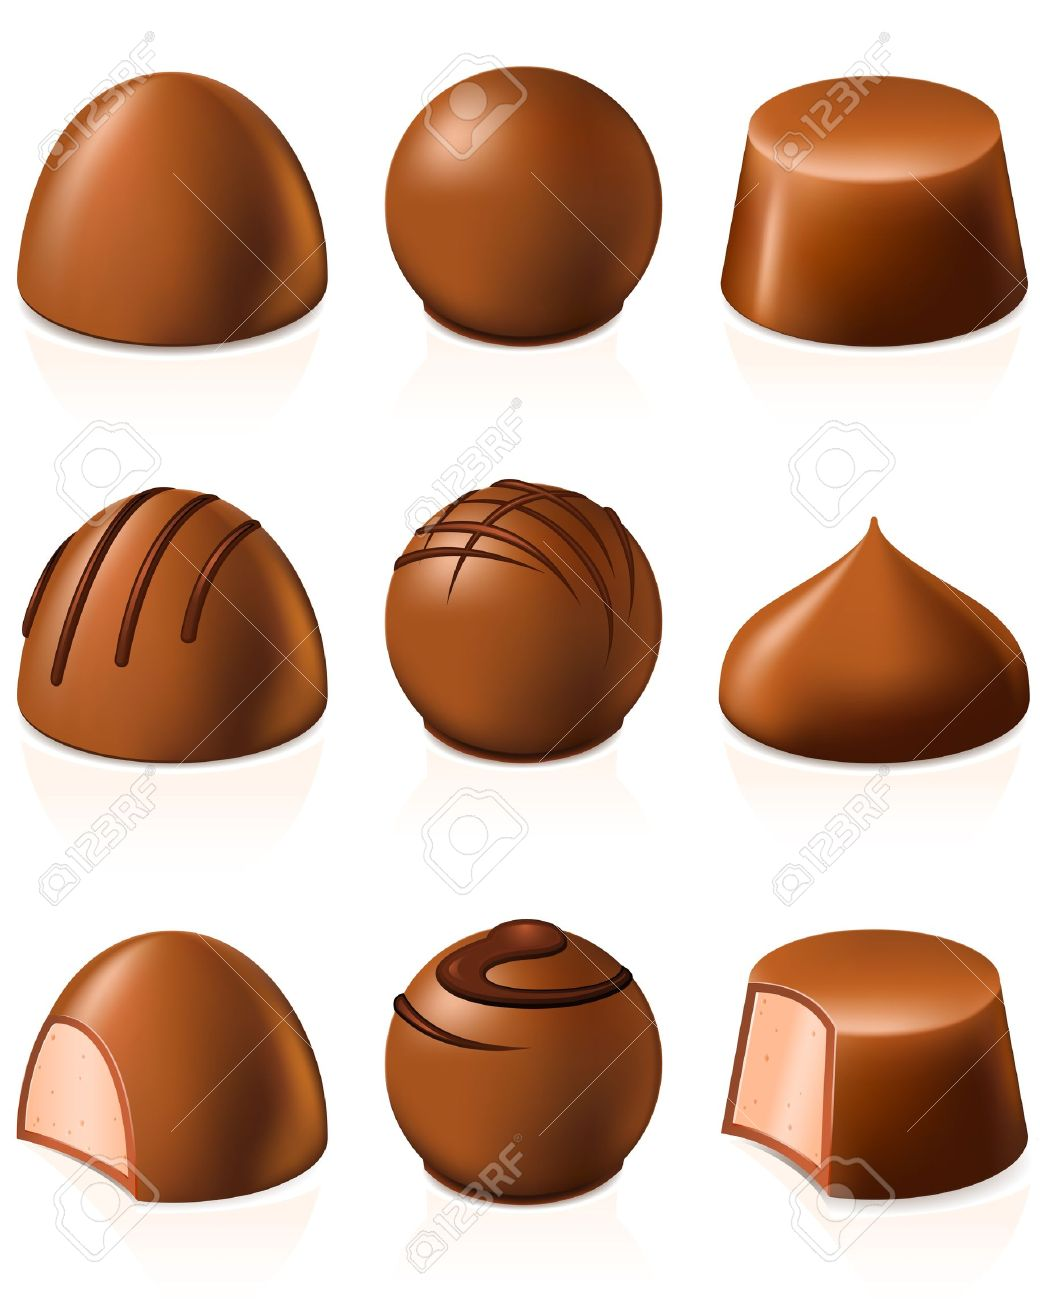 Truffle chocolates clipart #10